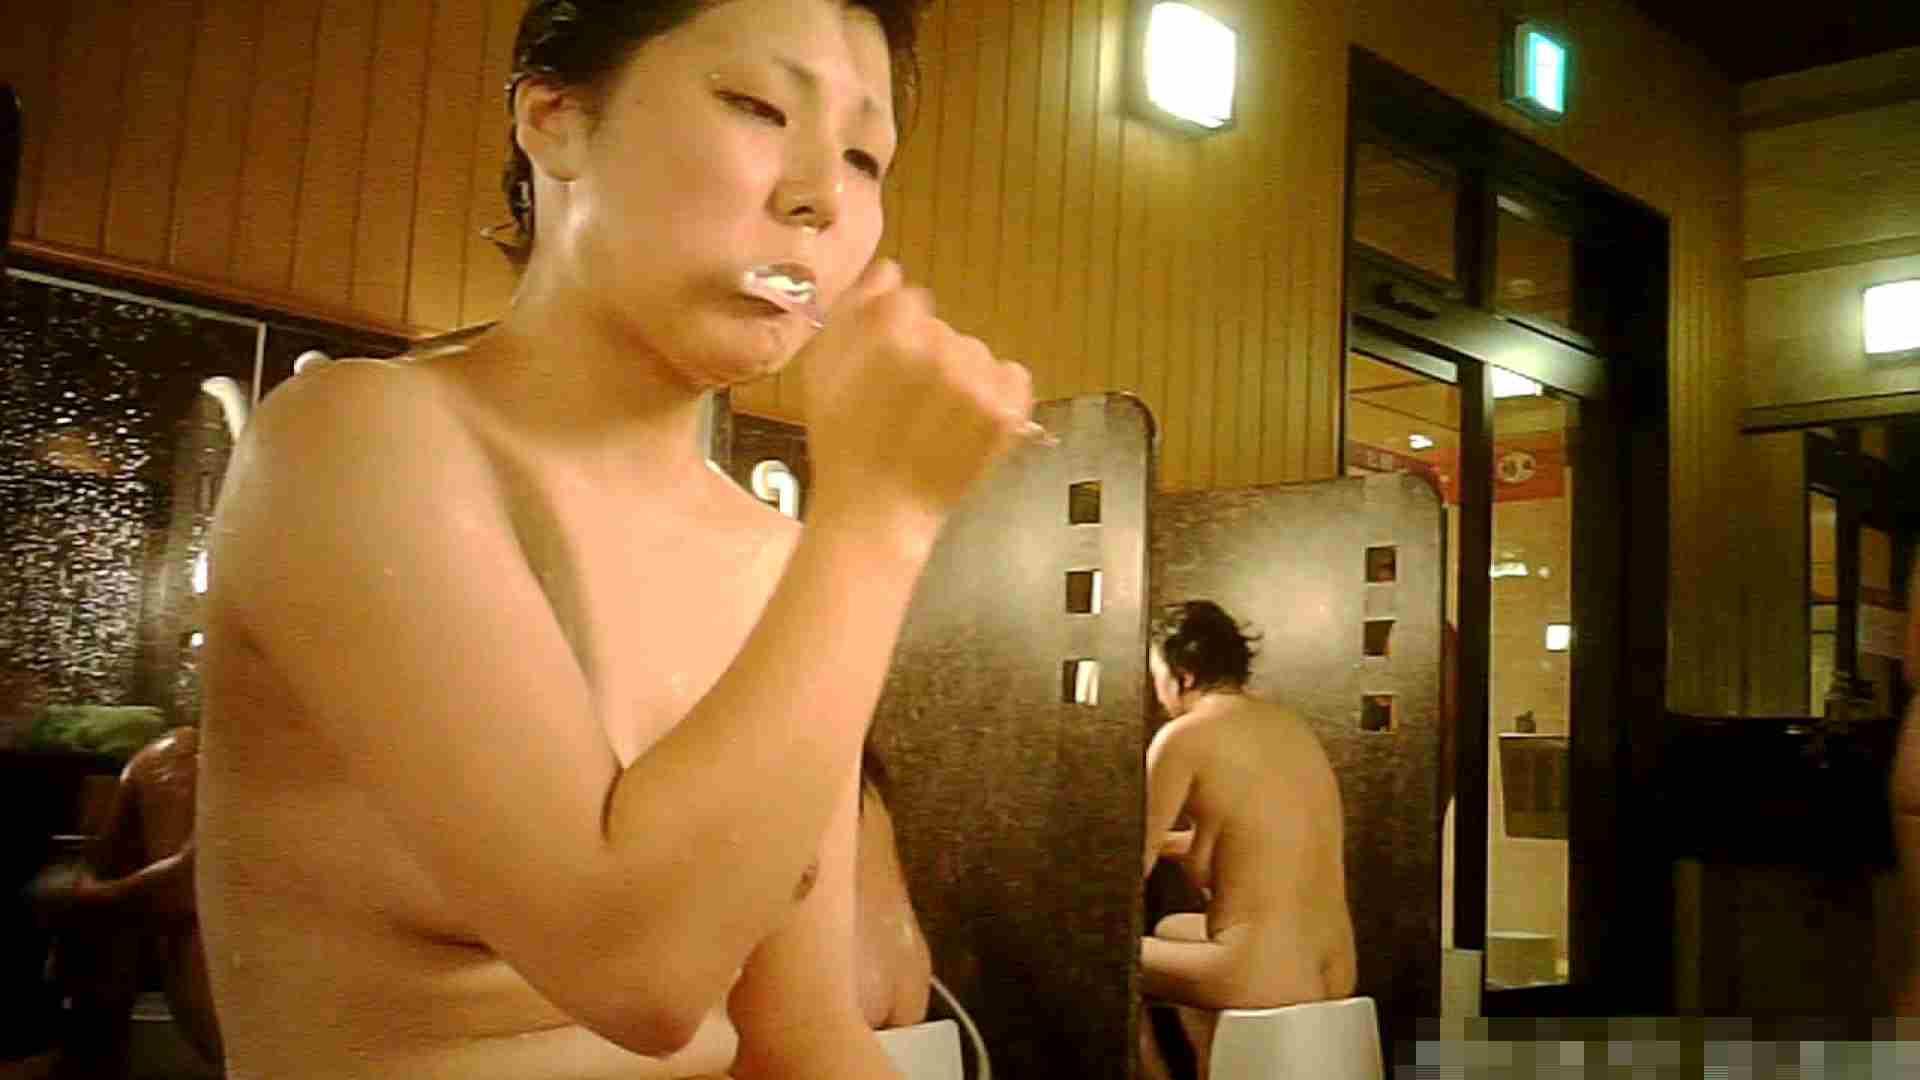 No.7 洗い場!!最近の嬢はオッパイ綺麗です。こちらも8個! 銭湯特撮  85連発 10